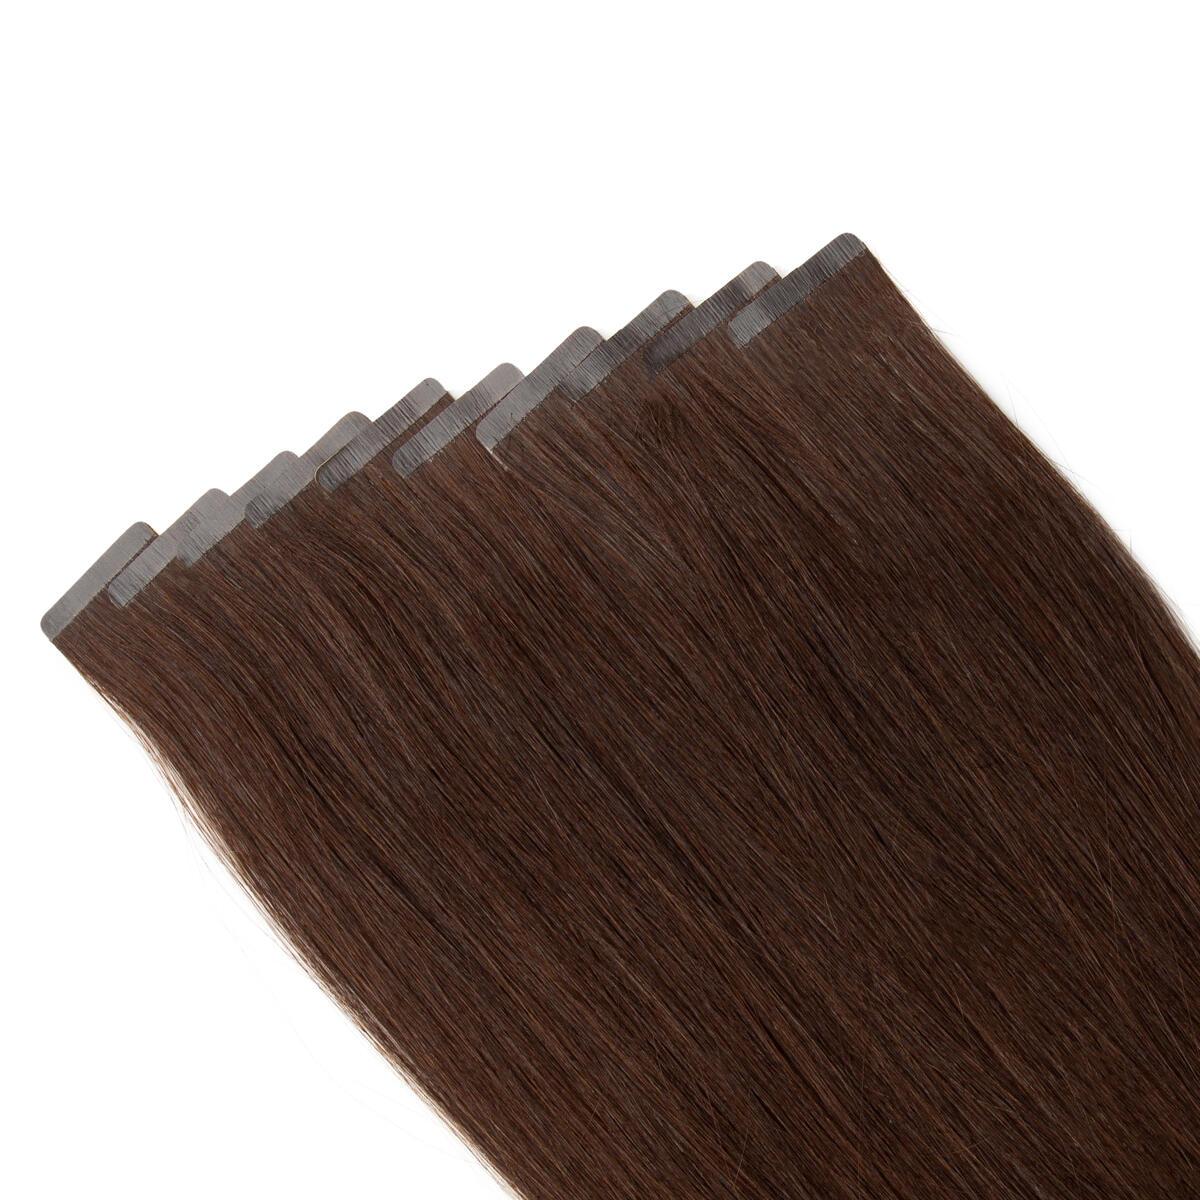 Rapunzel Sleek Tape Extension 2.3 Chocolate Brown 45 cm